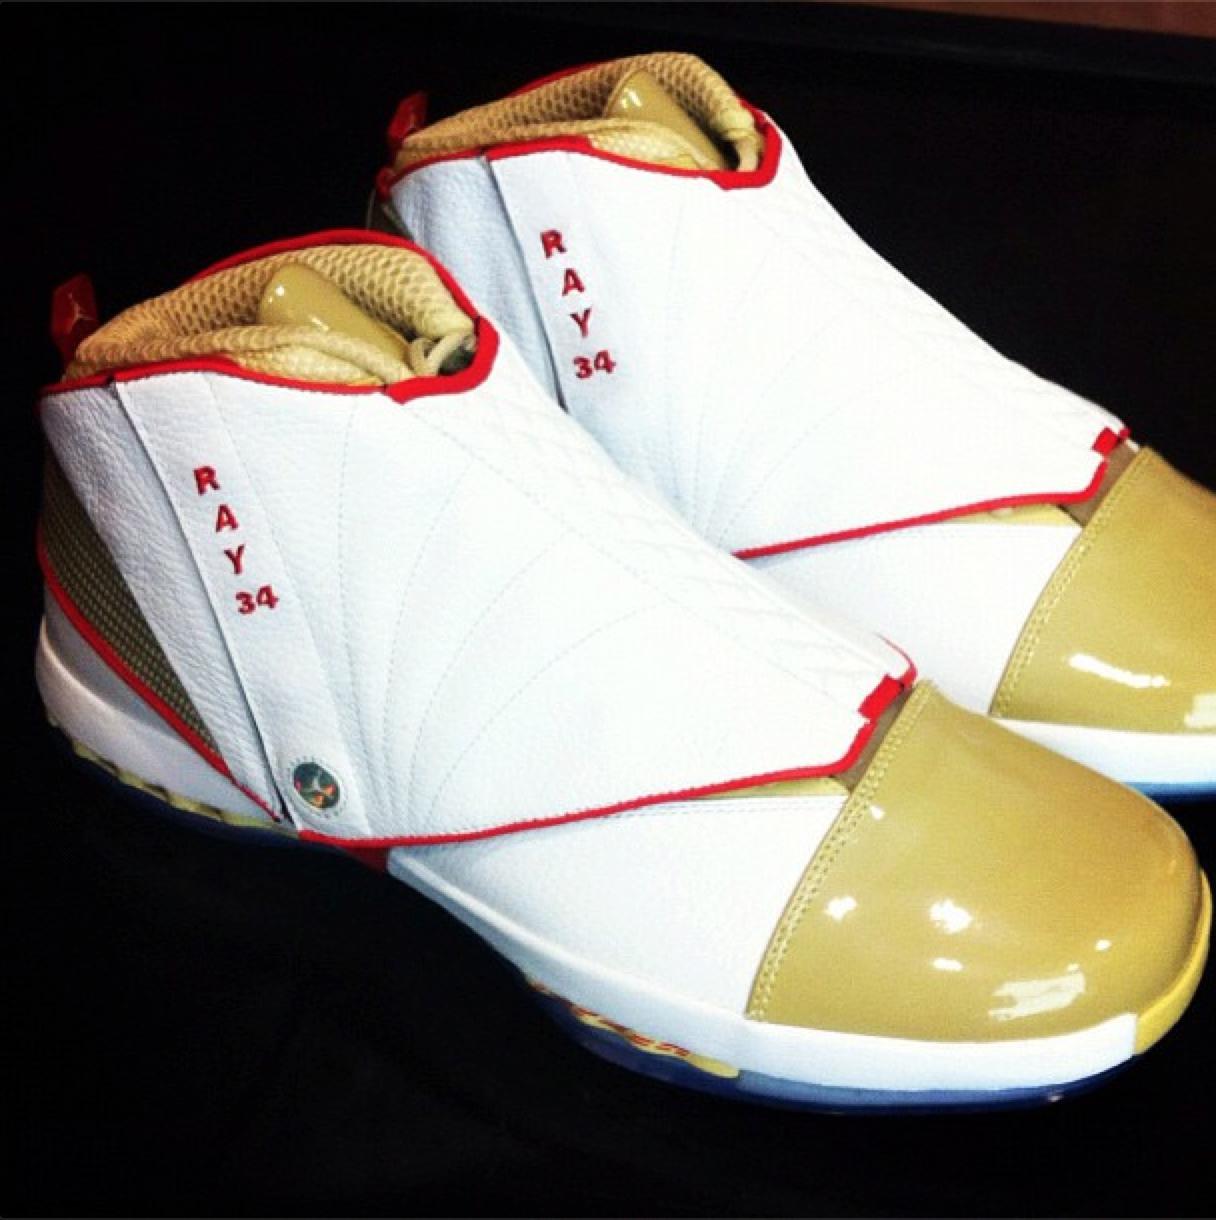 new product 209c6 f9dba Air Jordan XVI (16) Ray Allen Miami Heat Debut PE